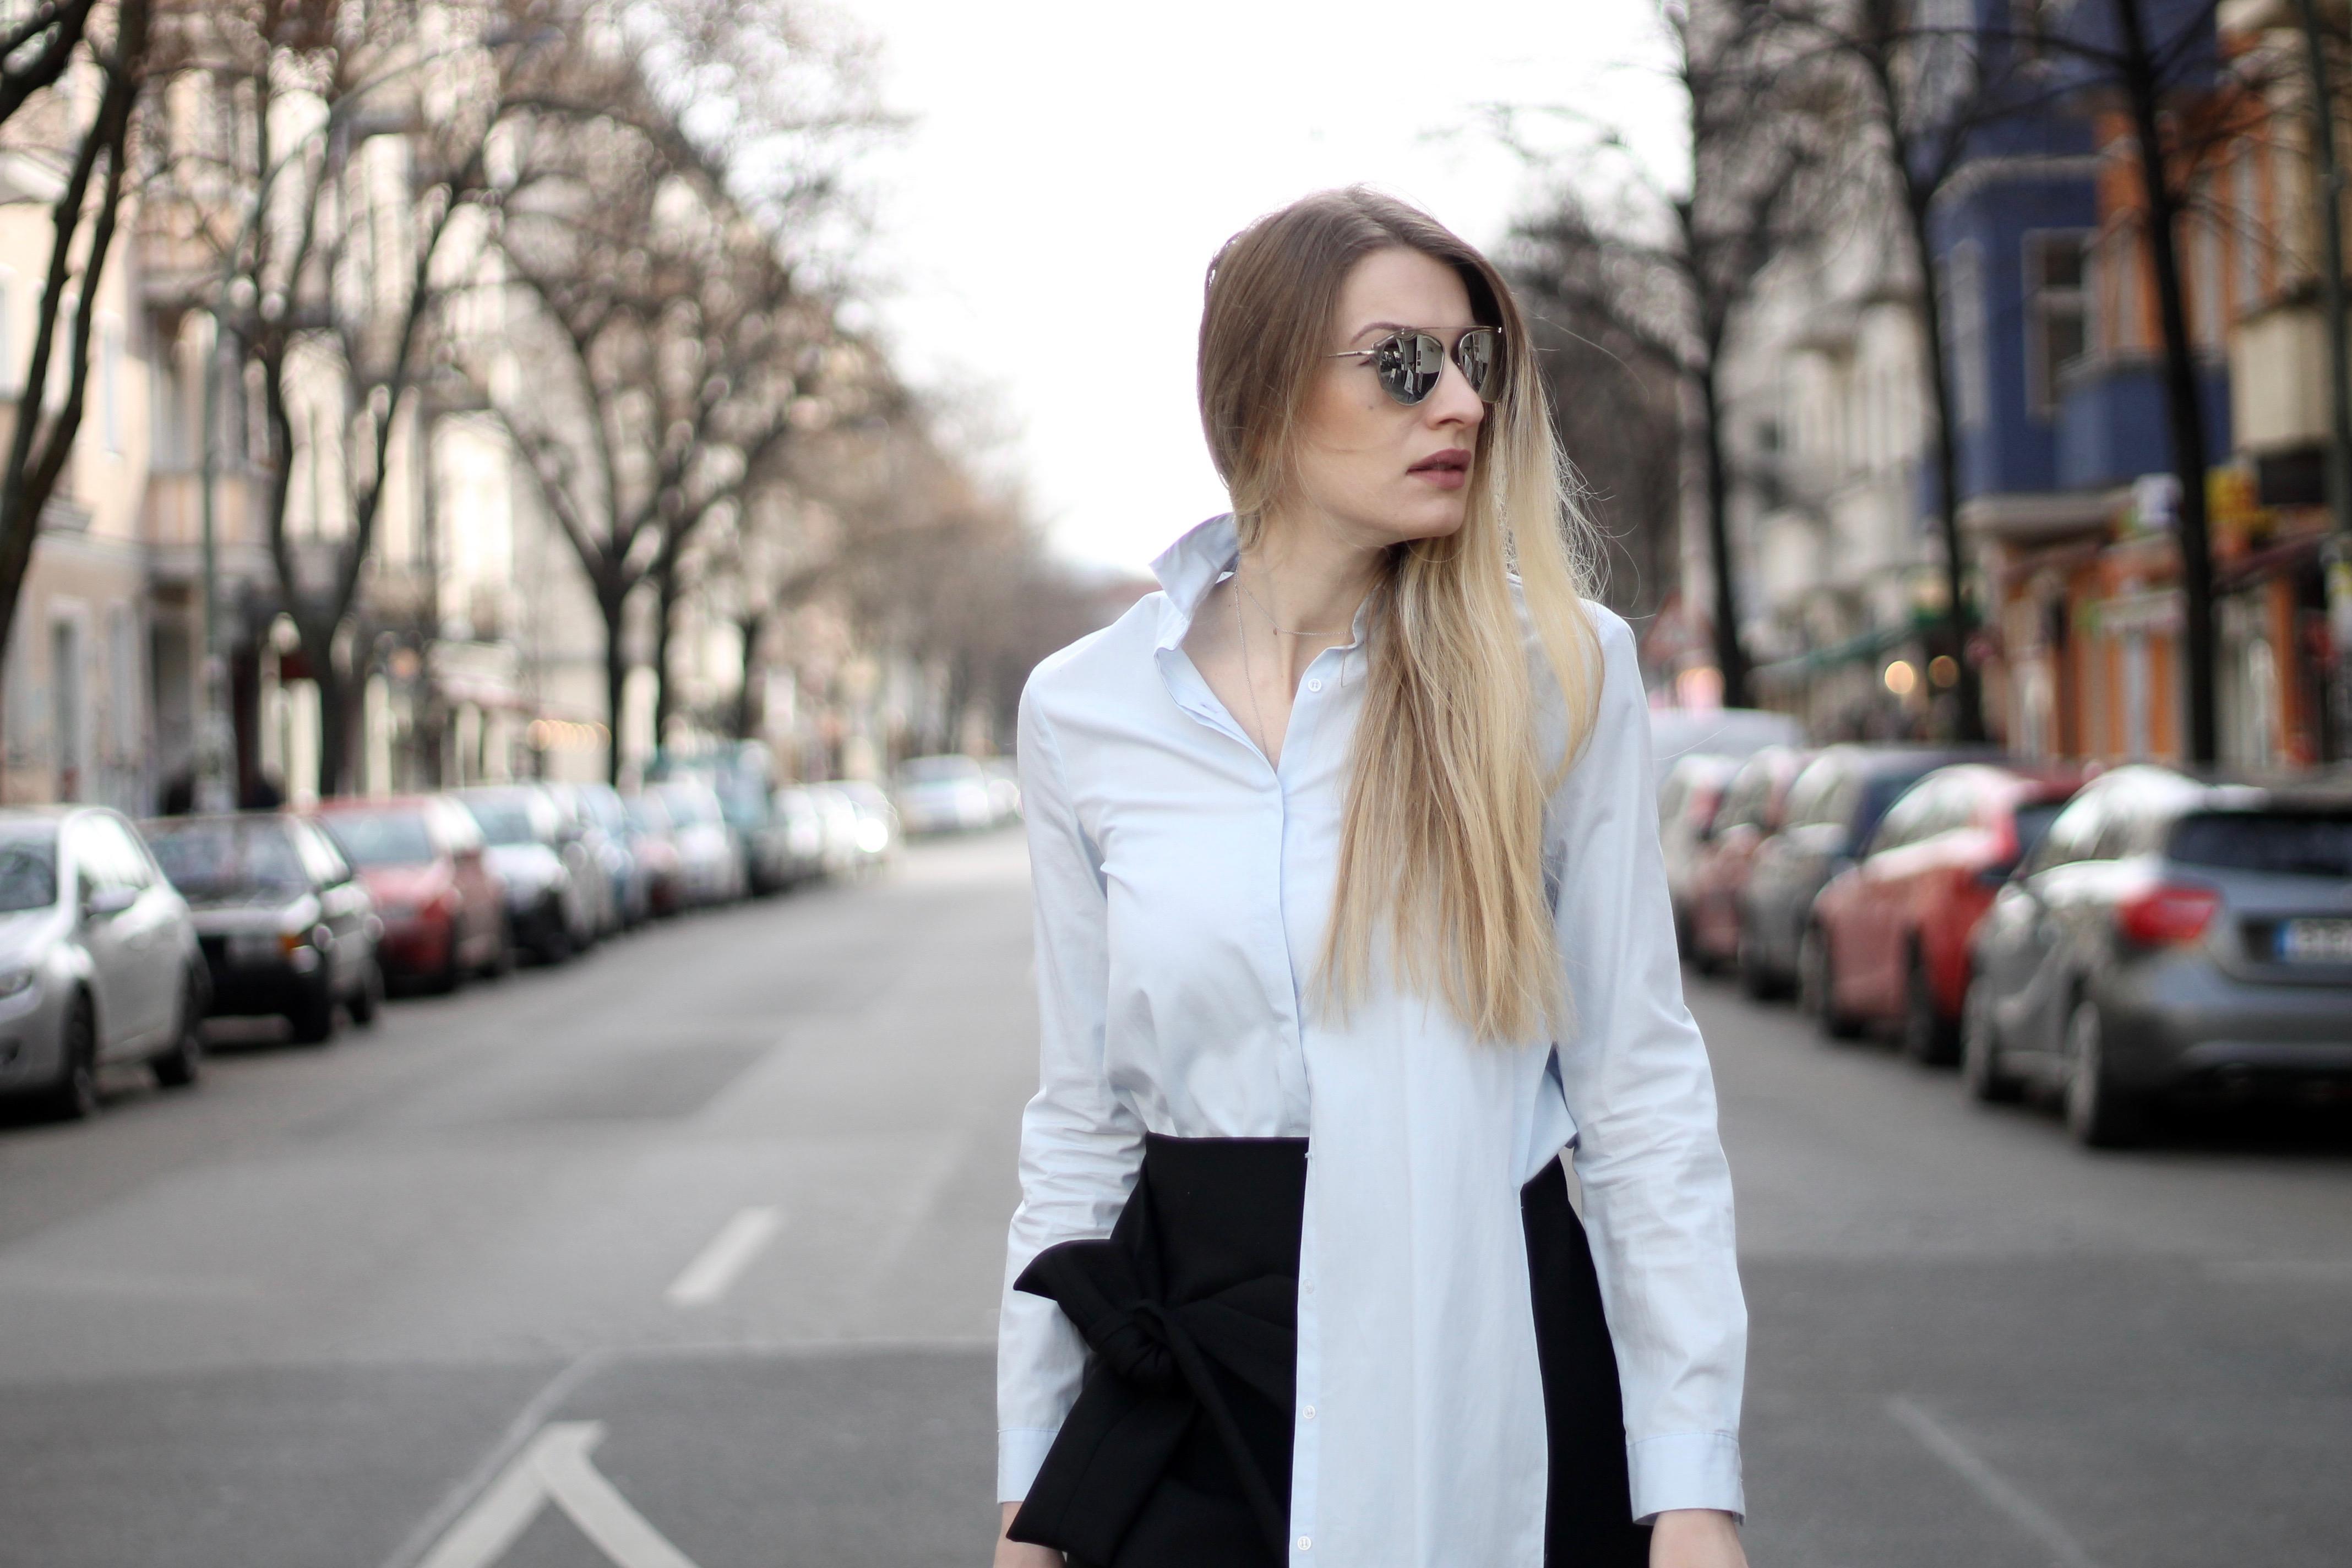 Mon_Mode Blog | Mon Mode | Fashionblog| Toronto Blog| Travel Blog| Confidence| Self Love| Toronto Blogger